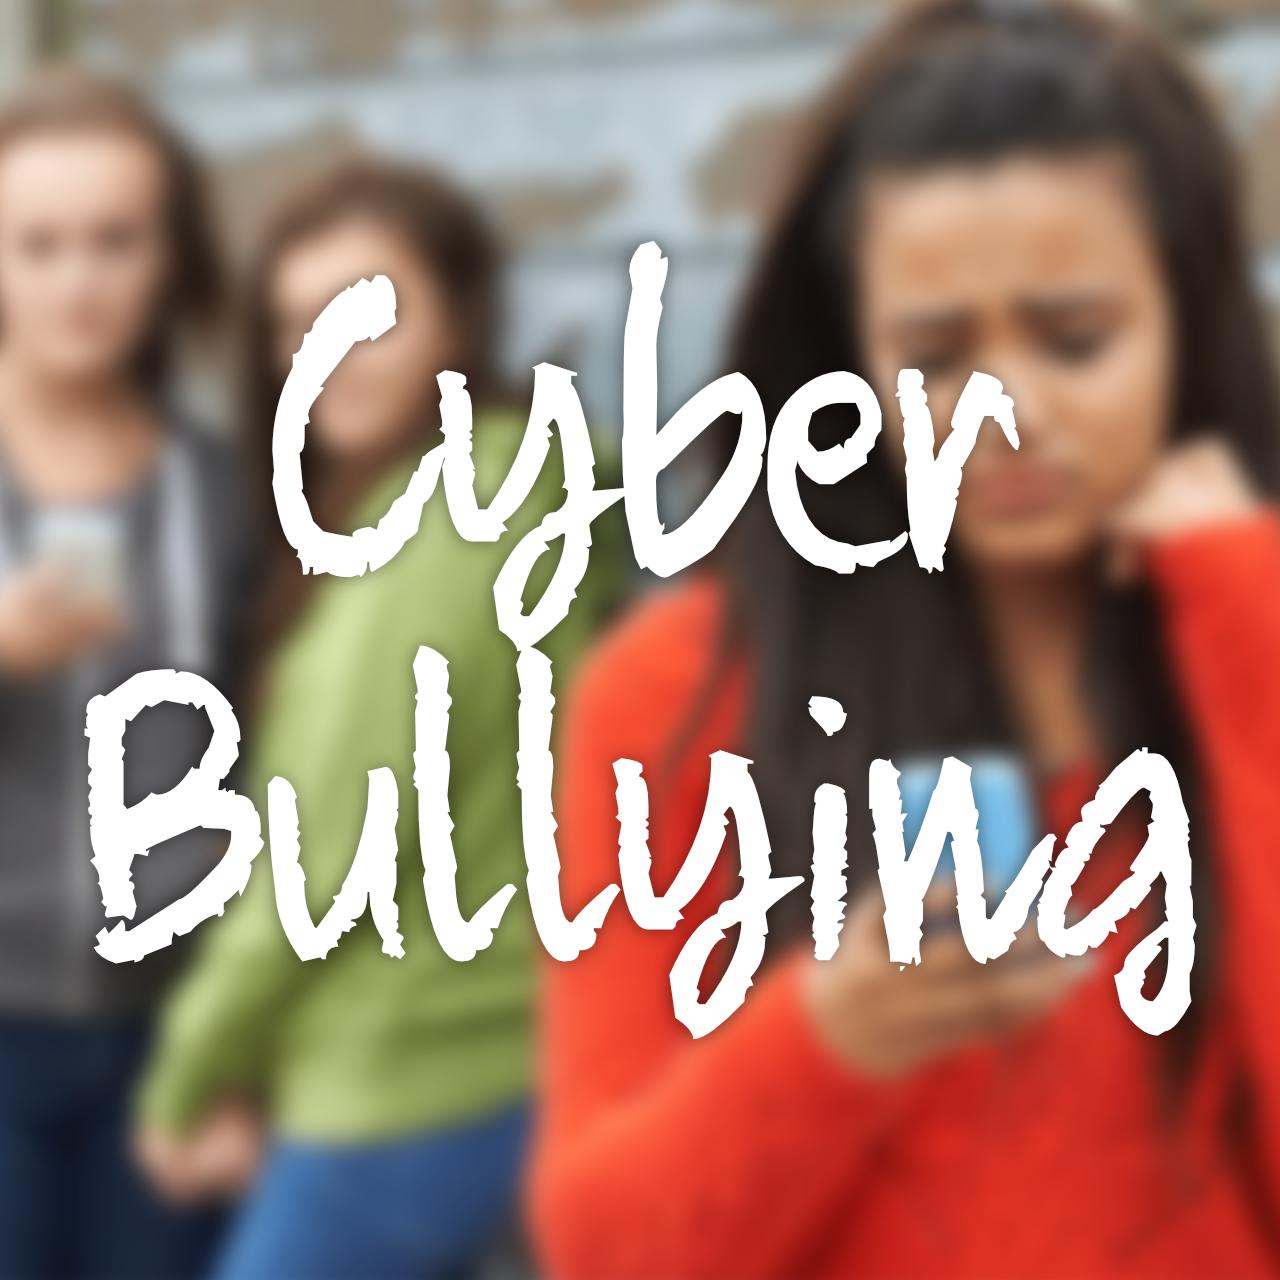 Cyber Bulllying.jpg